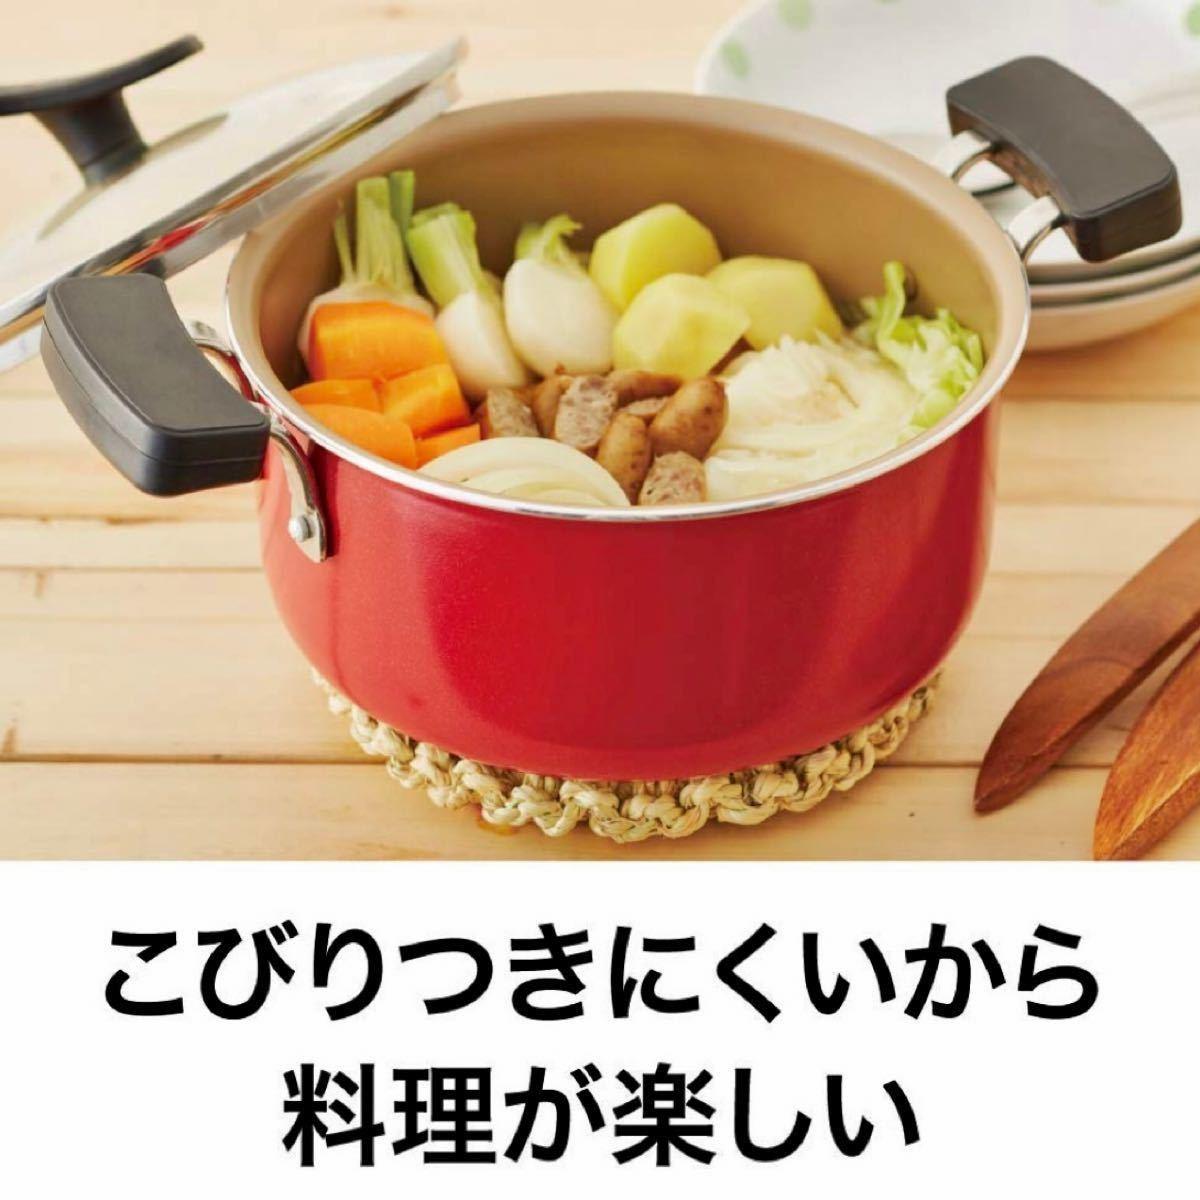 【新品未開封】evercook両手鍋20cmガス火*IH対応